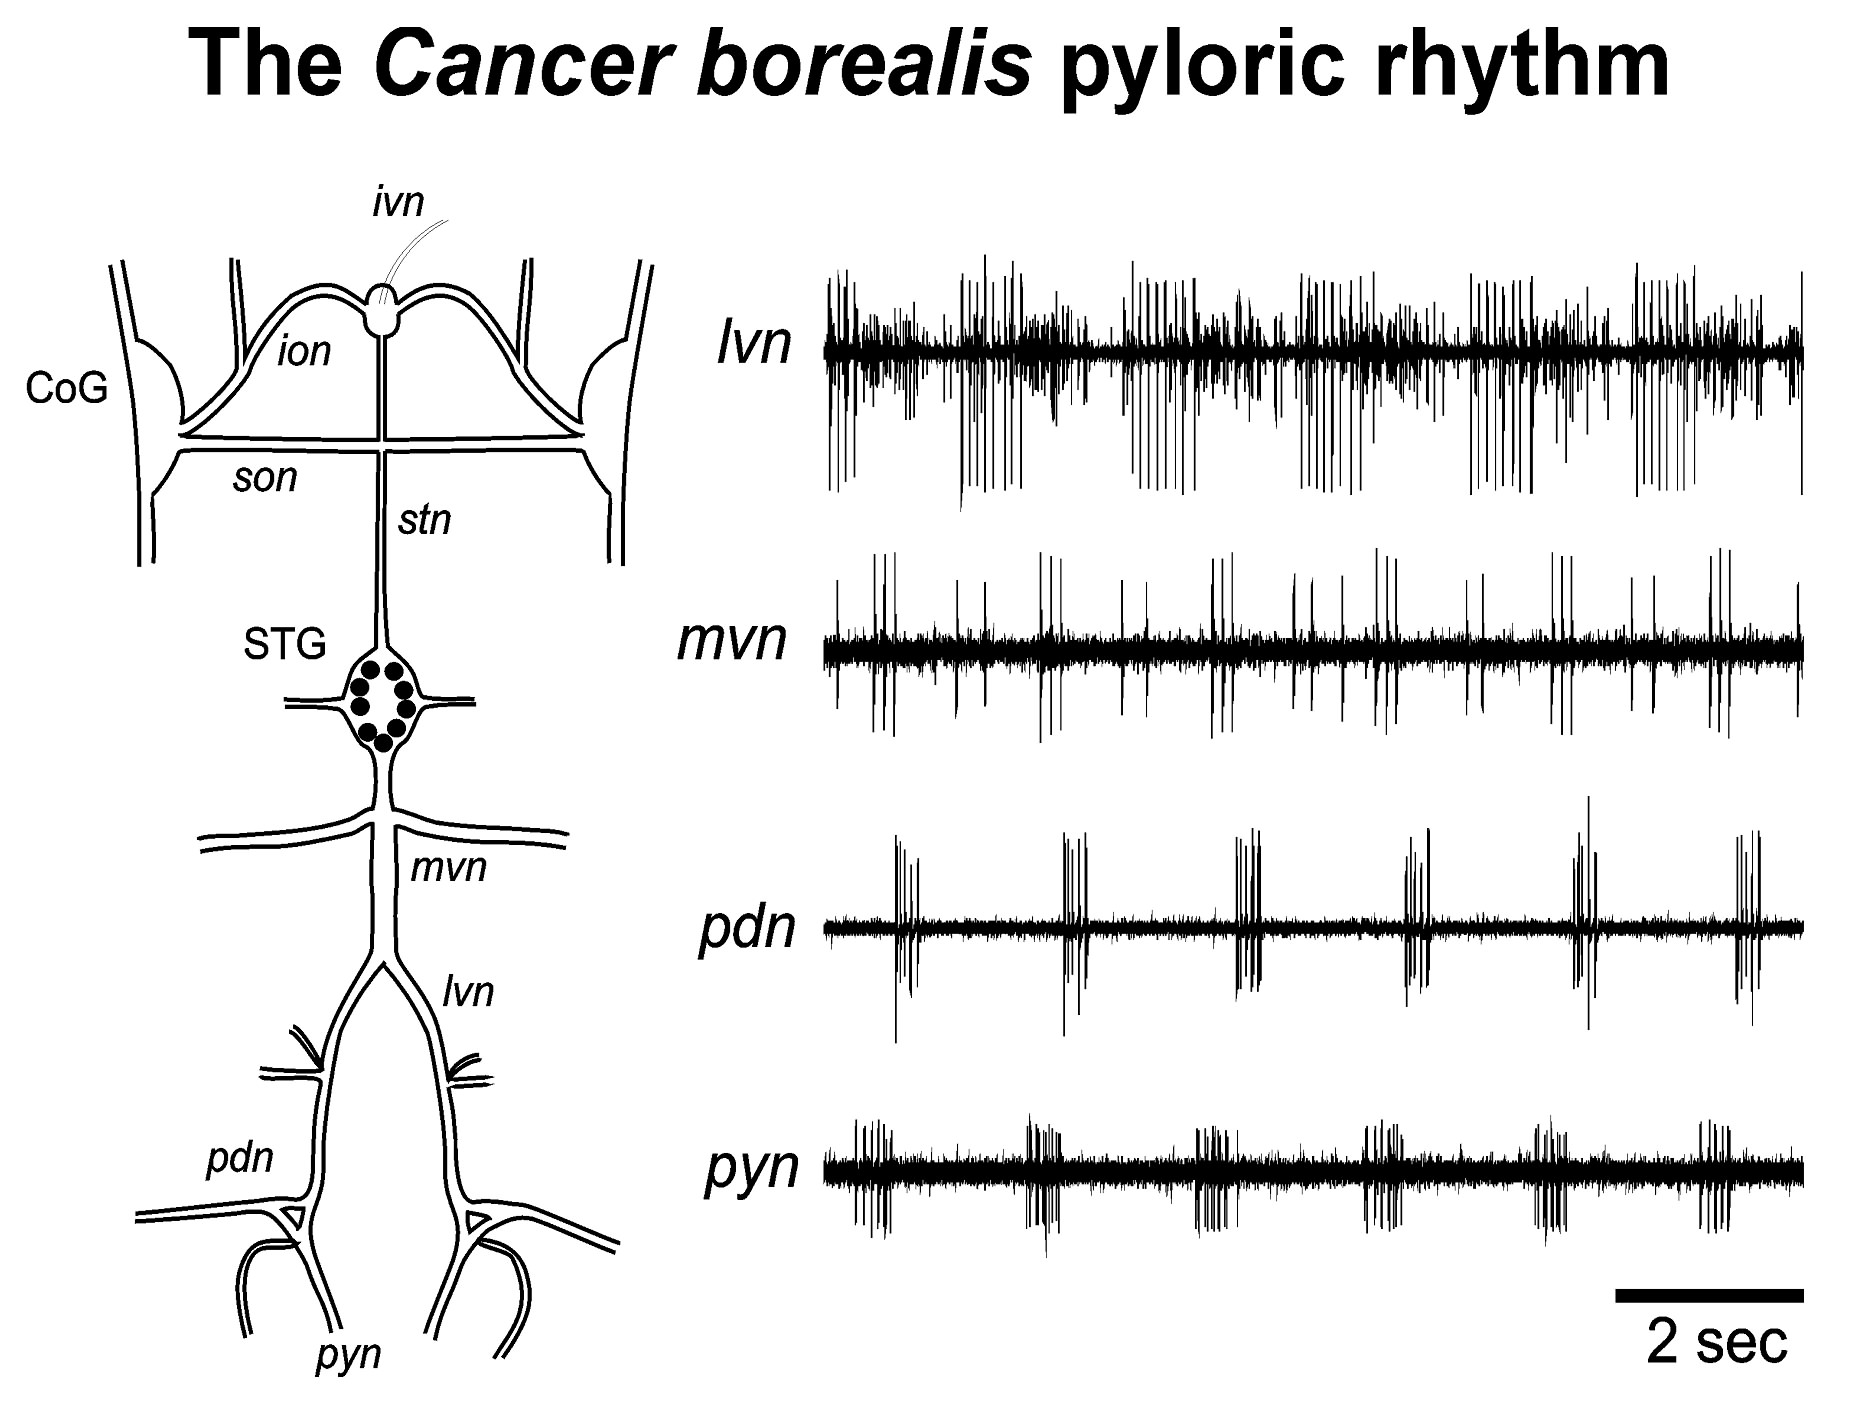 pyloricRhythmCancer